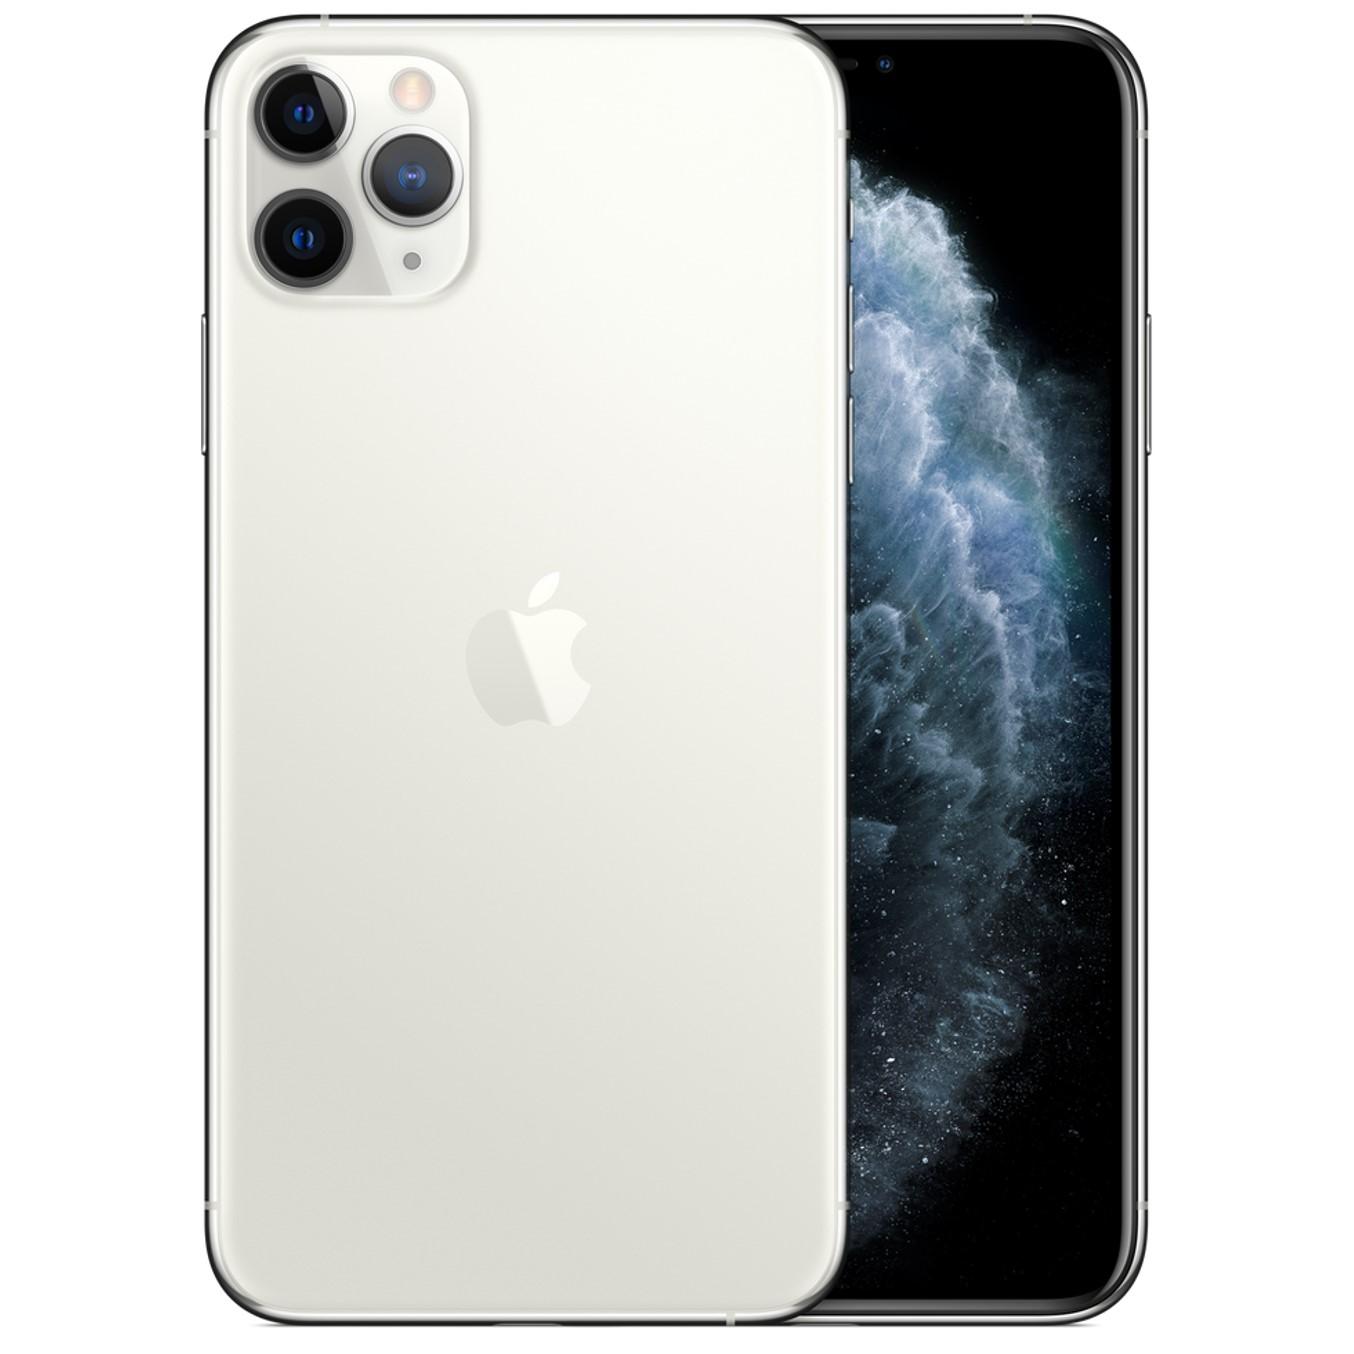 Telefono movil smartphone apple iphone 11 pro max 64gb silver - 6.5pulgadas - dual sim - triple camara trasera